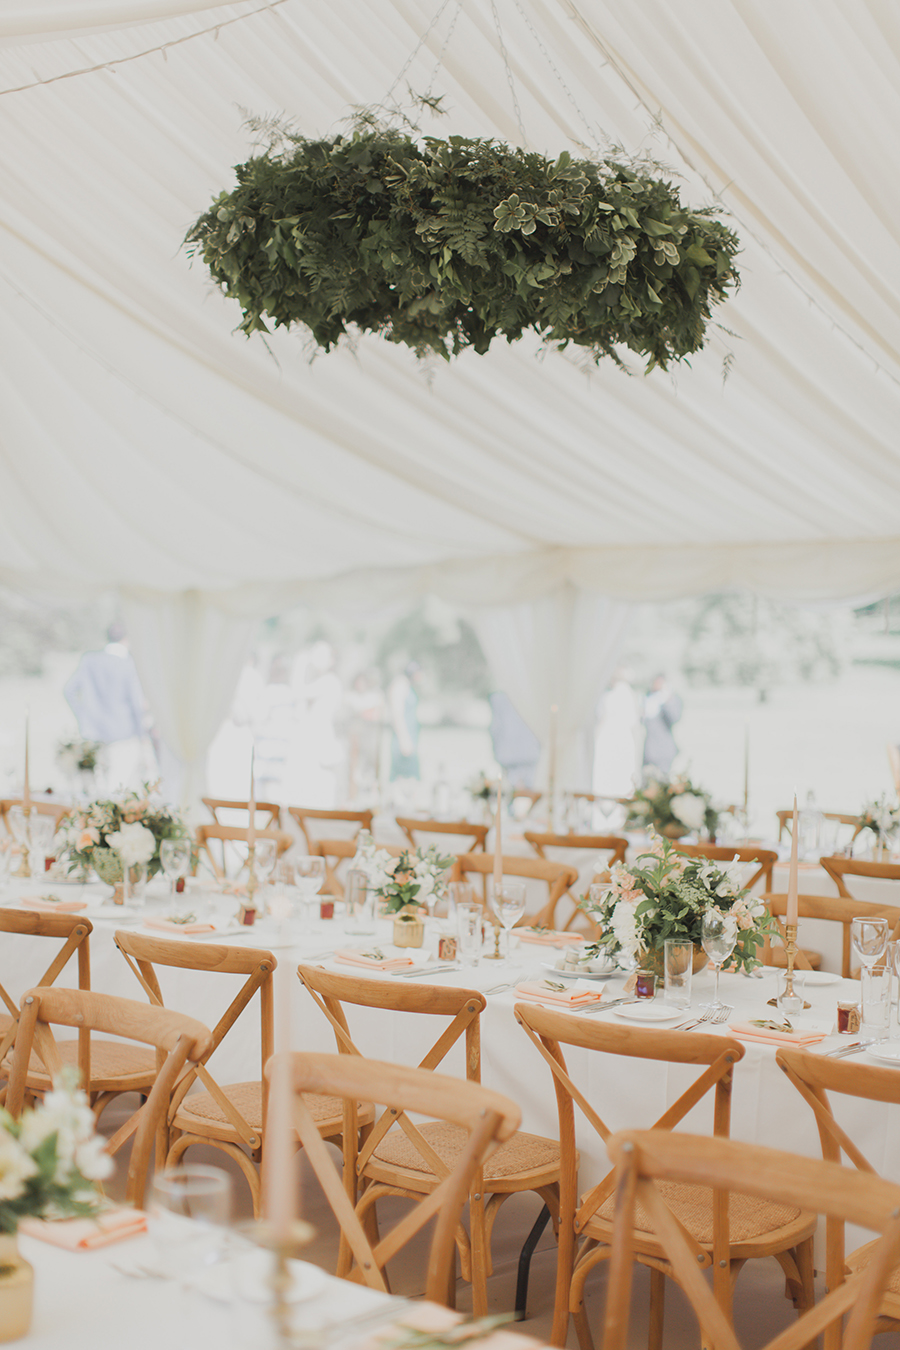 Summer Marquee Wedding by Ferri Photography